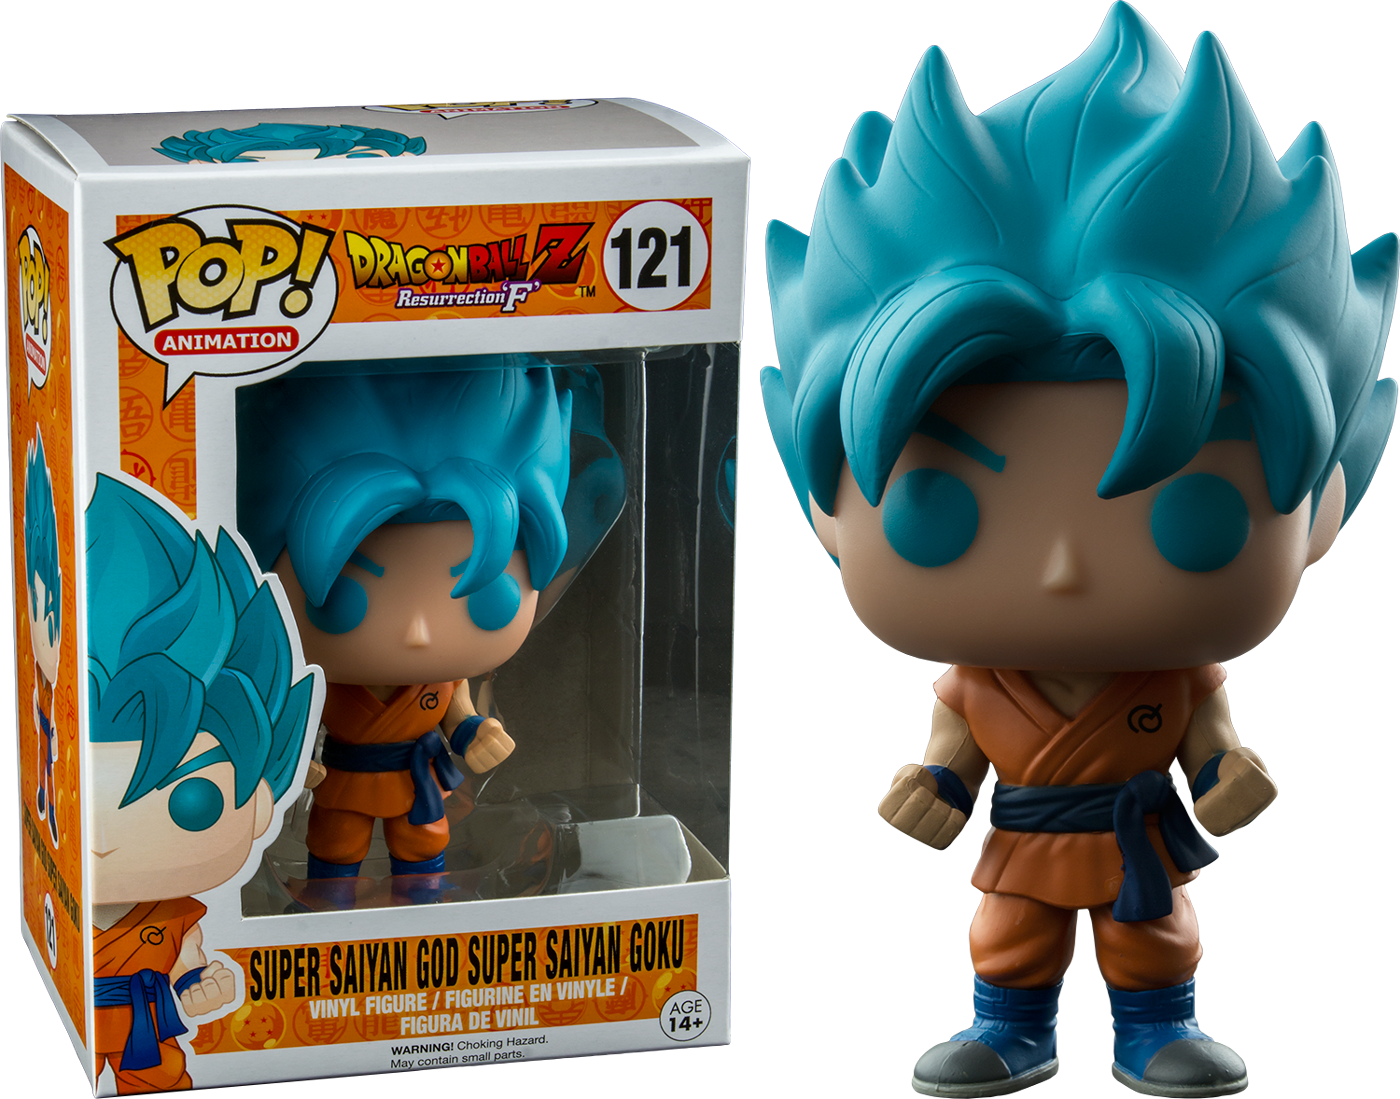 PRE-ORDER Exclusive Dragon Ball Z - Super Saiyan God Super Saiyan Goku Pop! Vinyl Figure